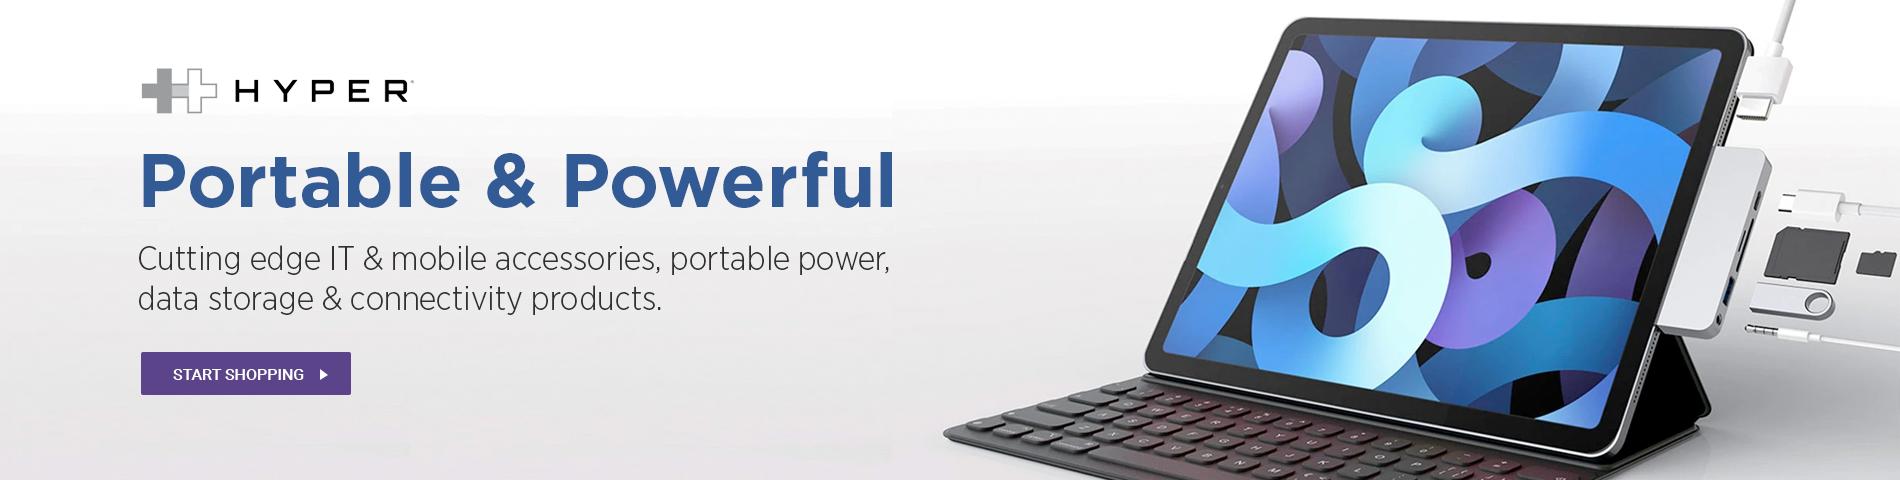 Hyper - Portable & Powerful